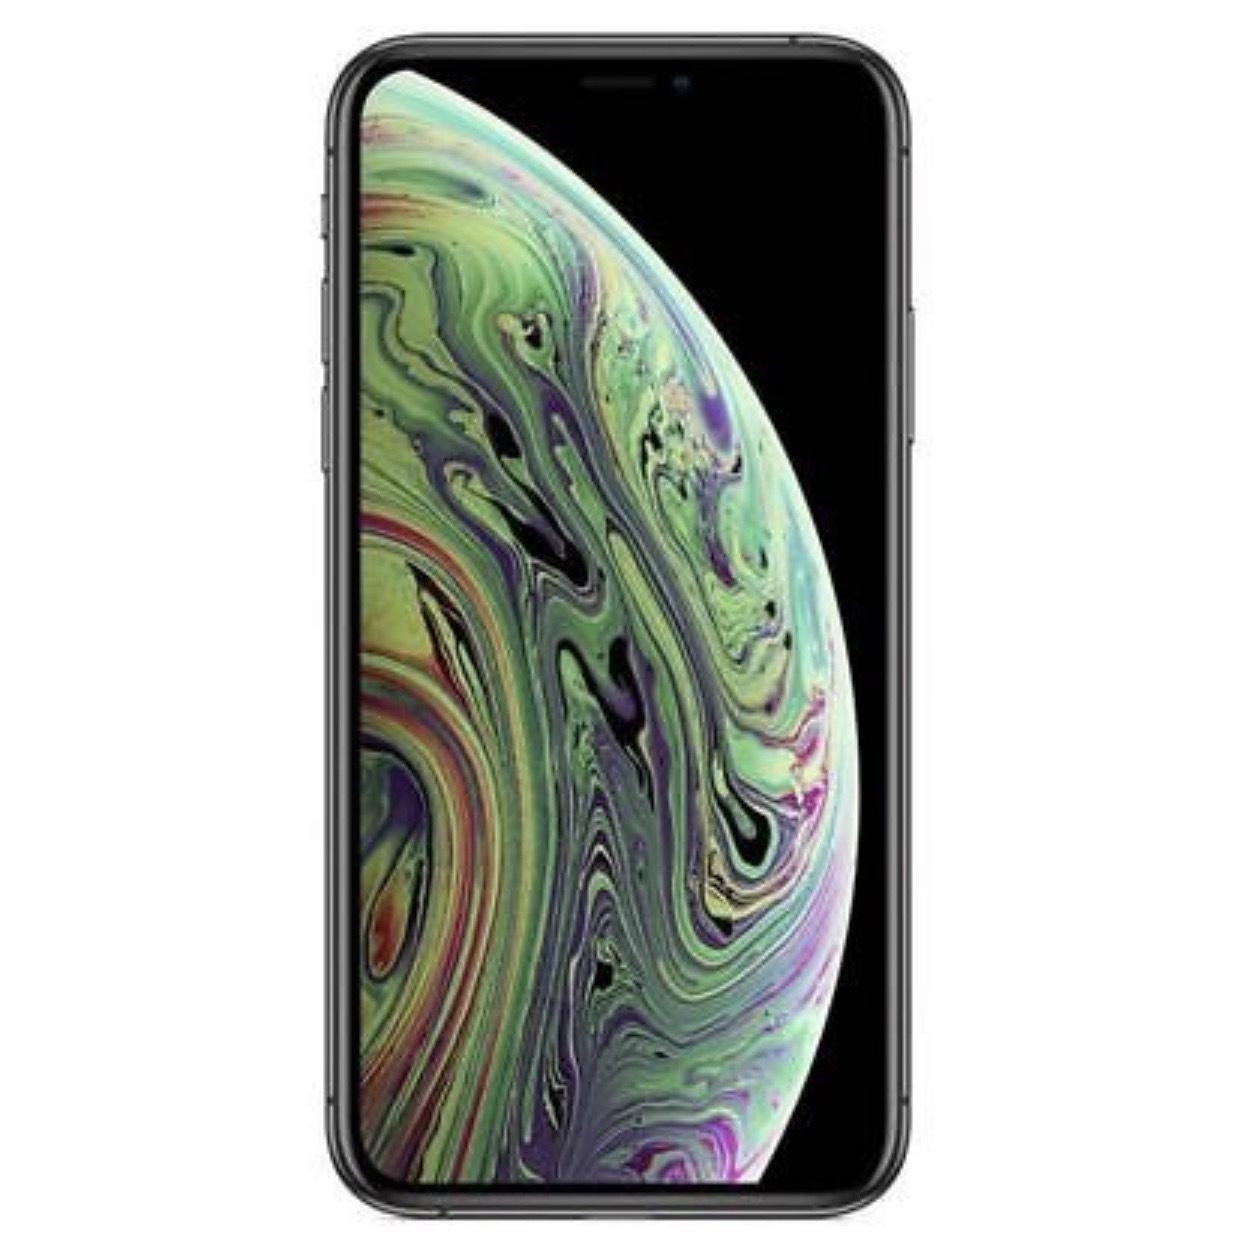 IPHONE XS MAX 64gb gris espacial nuevo